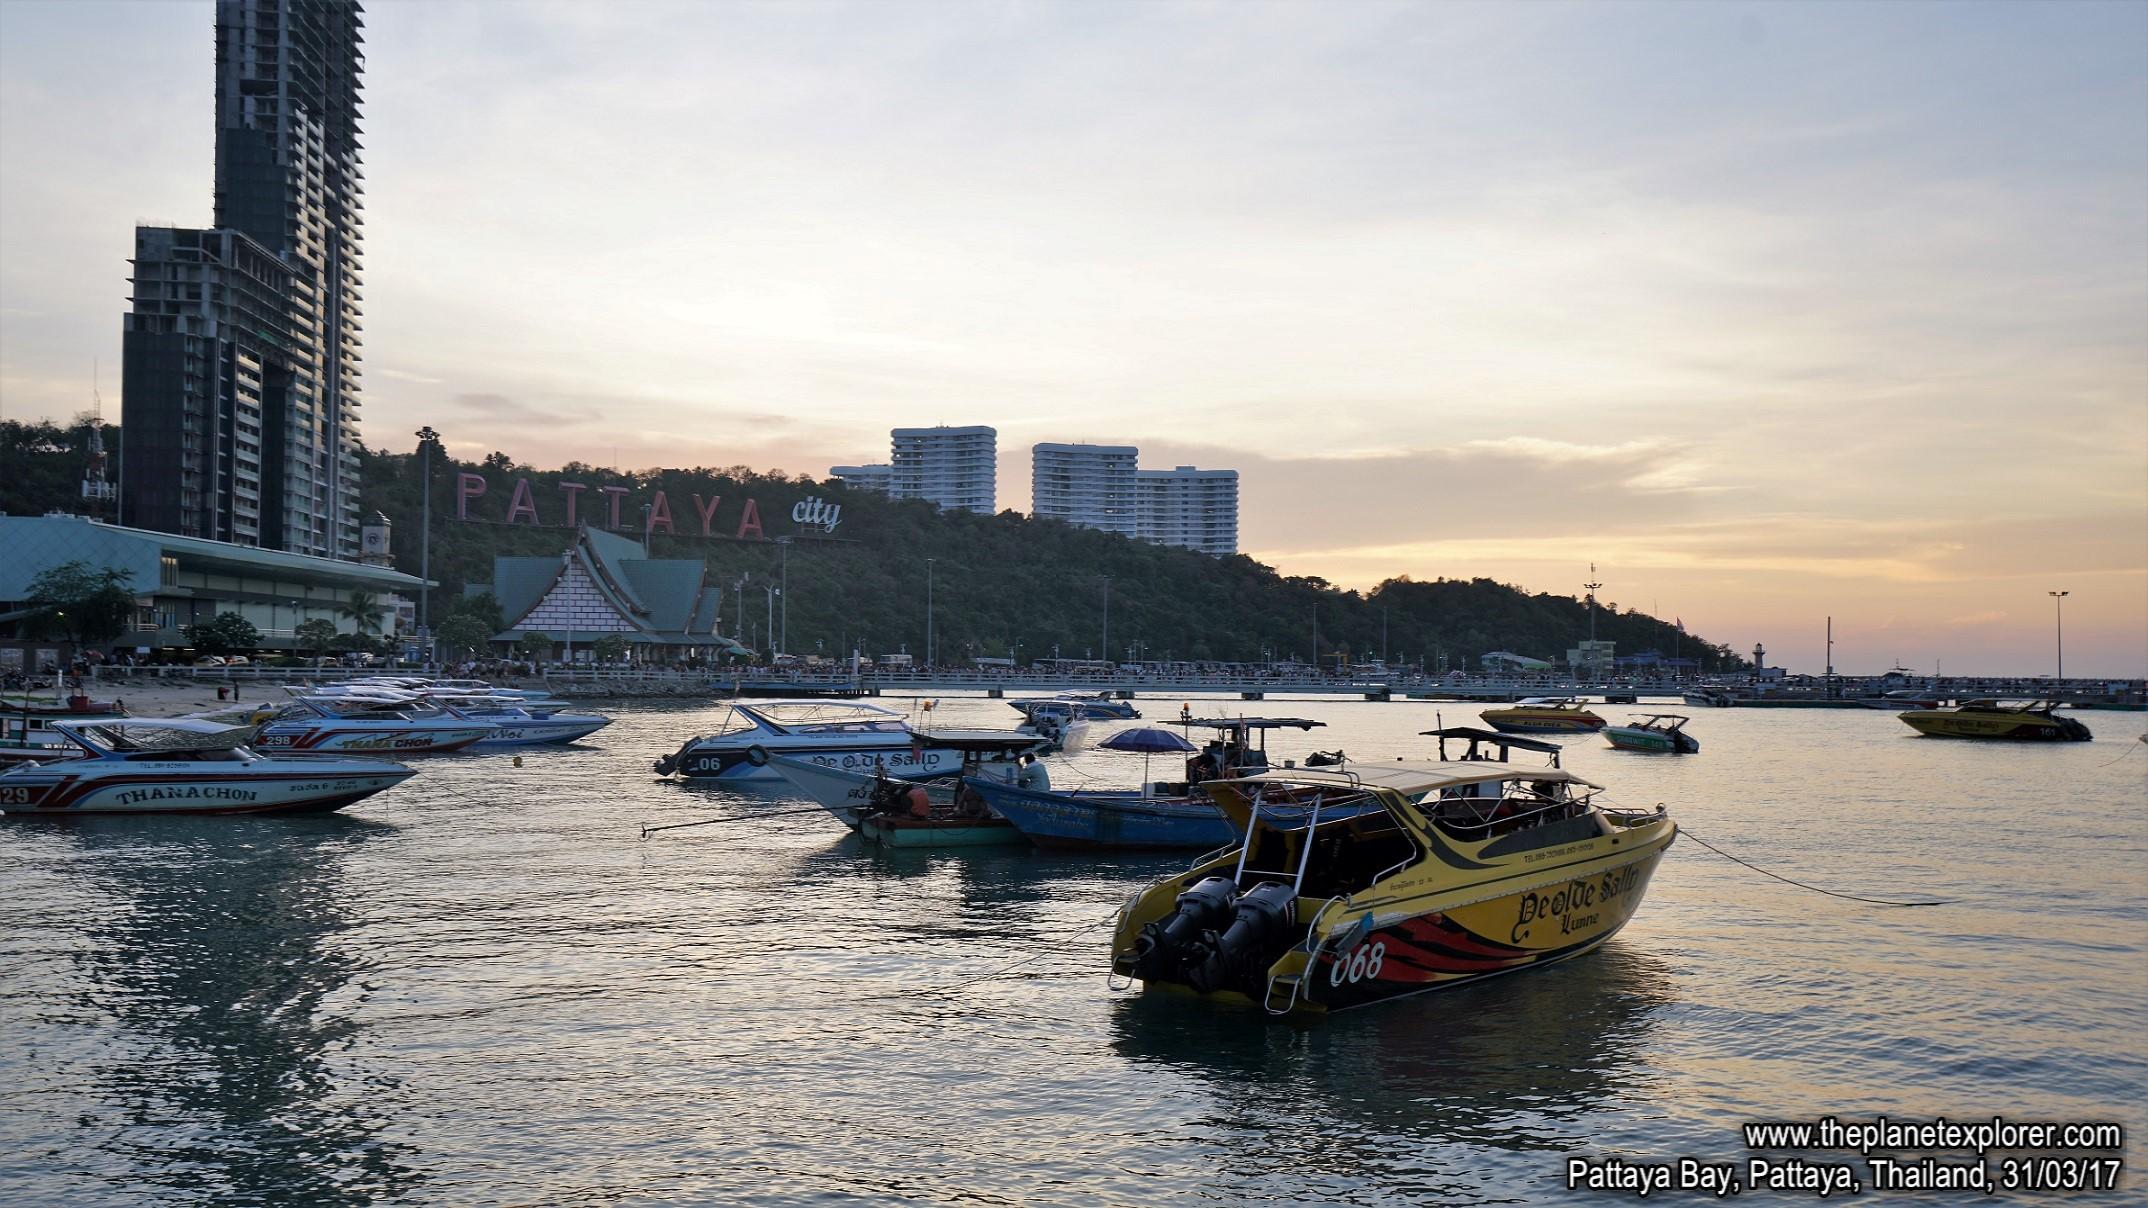 2017-03-31_1821_Thailand_Pattaya_Pattaya Beach_DSC04025_s7R2_LR_@